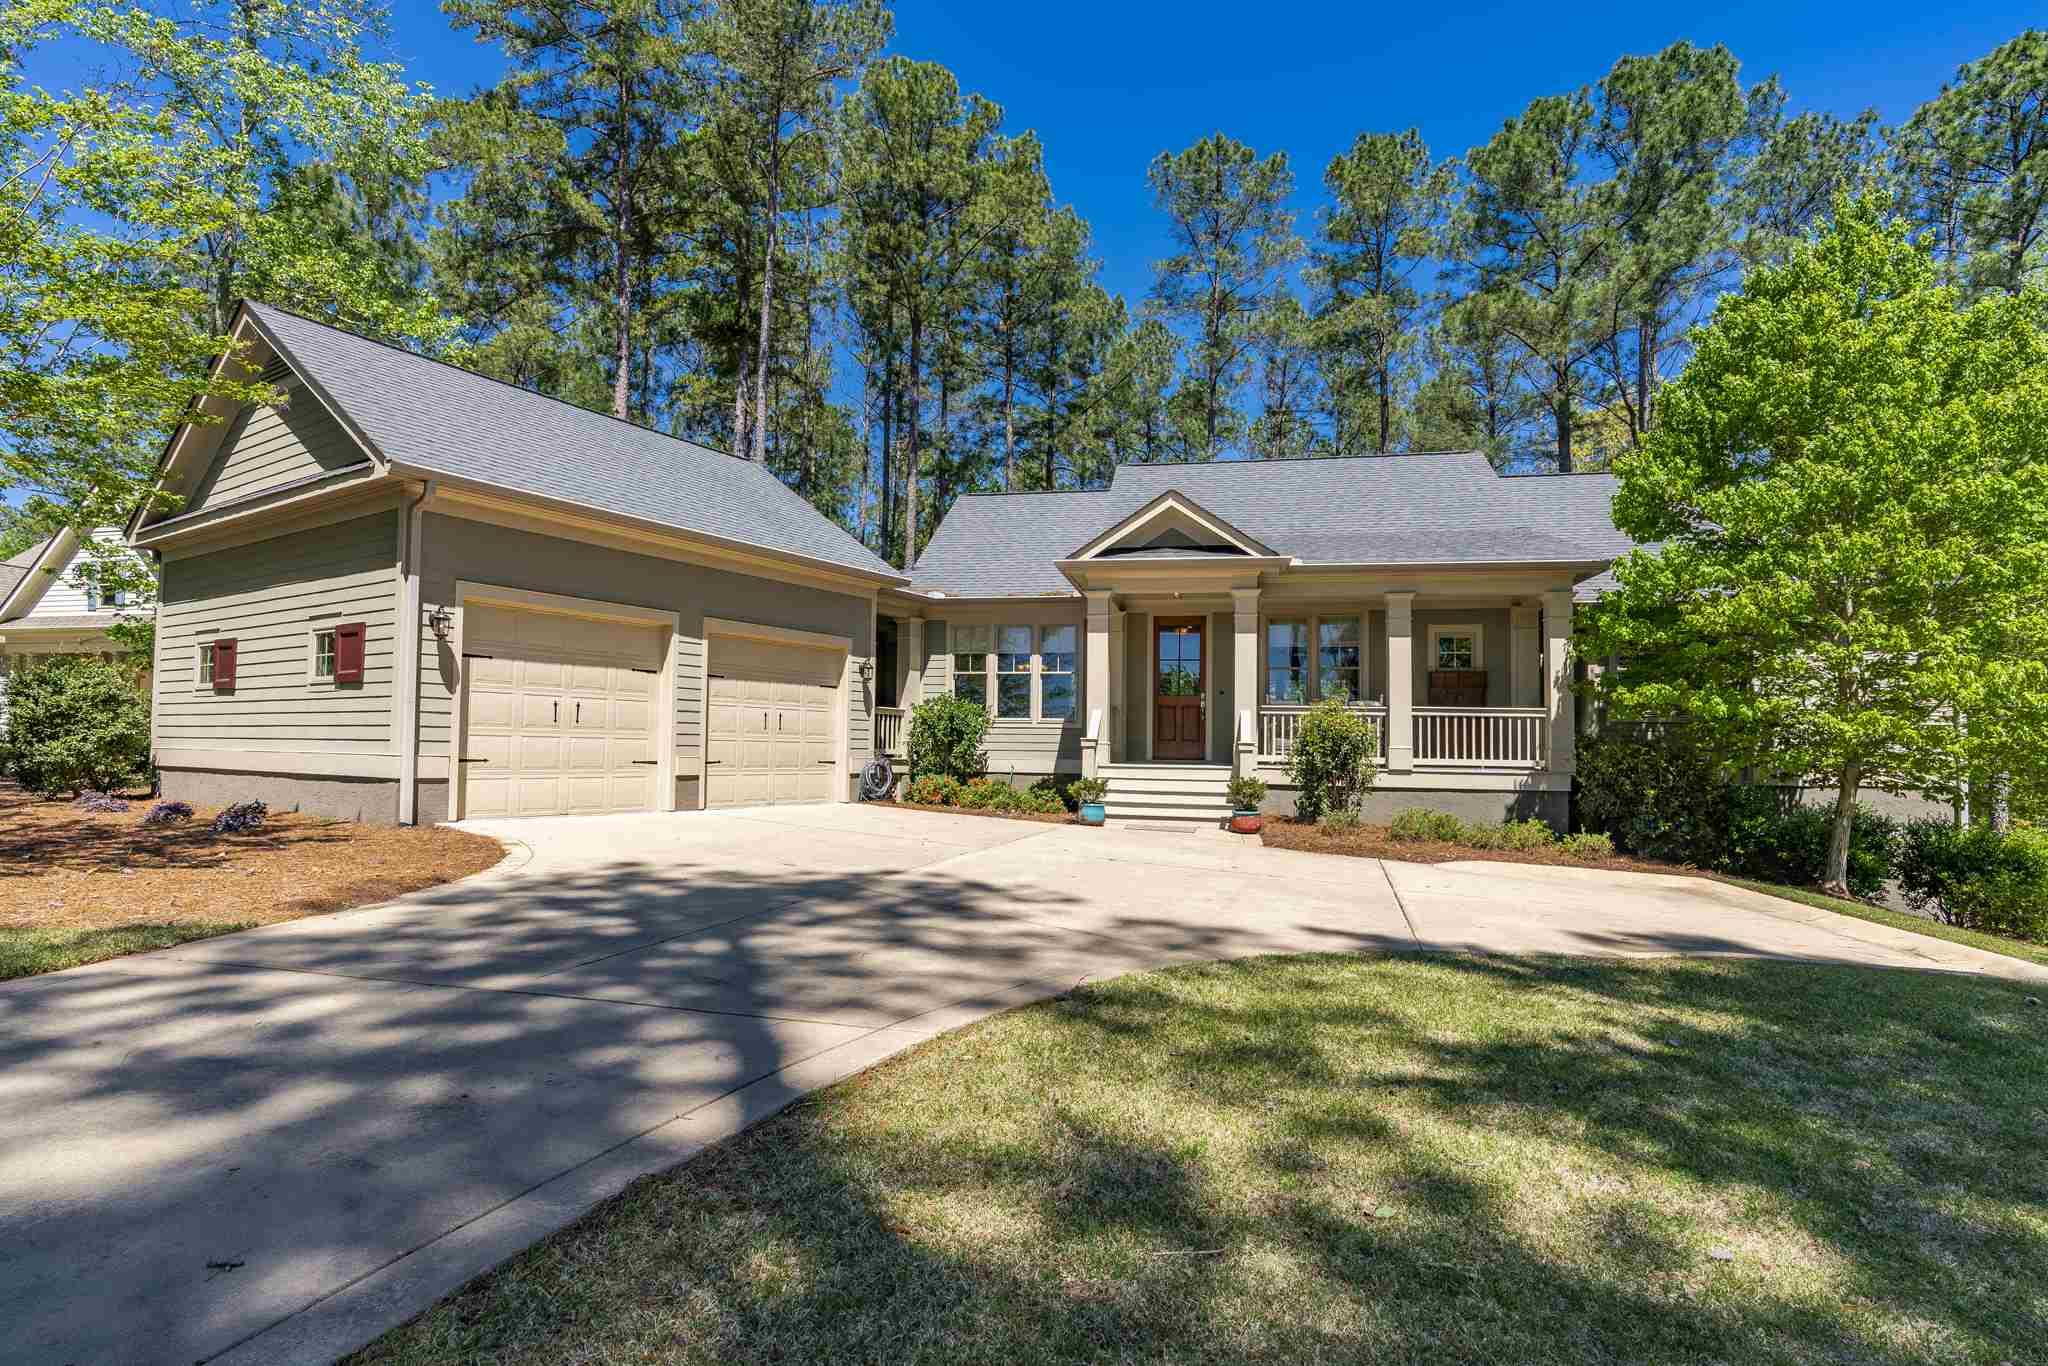 1401 GARNERS FERRY, Lake Oconee Reynolds Landing in Greene County, GA 30642 Home for Sale